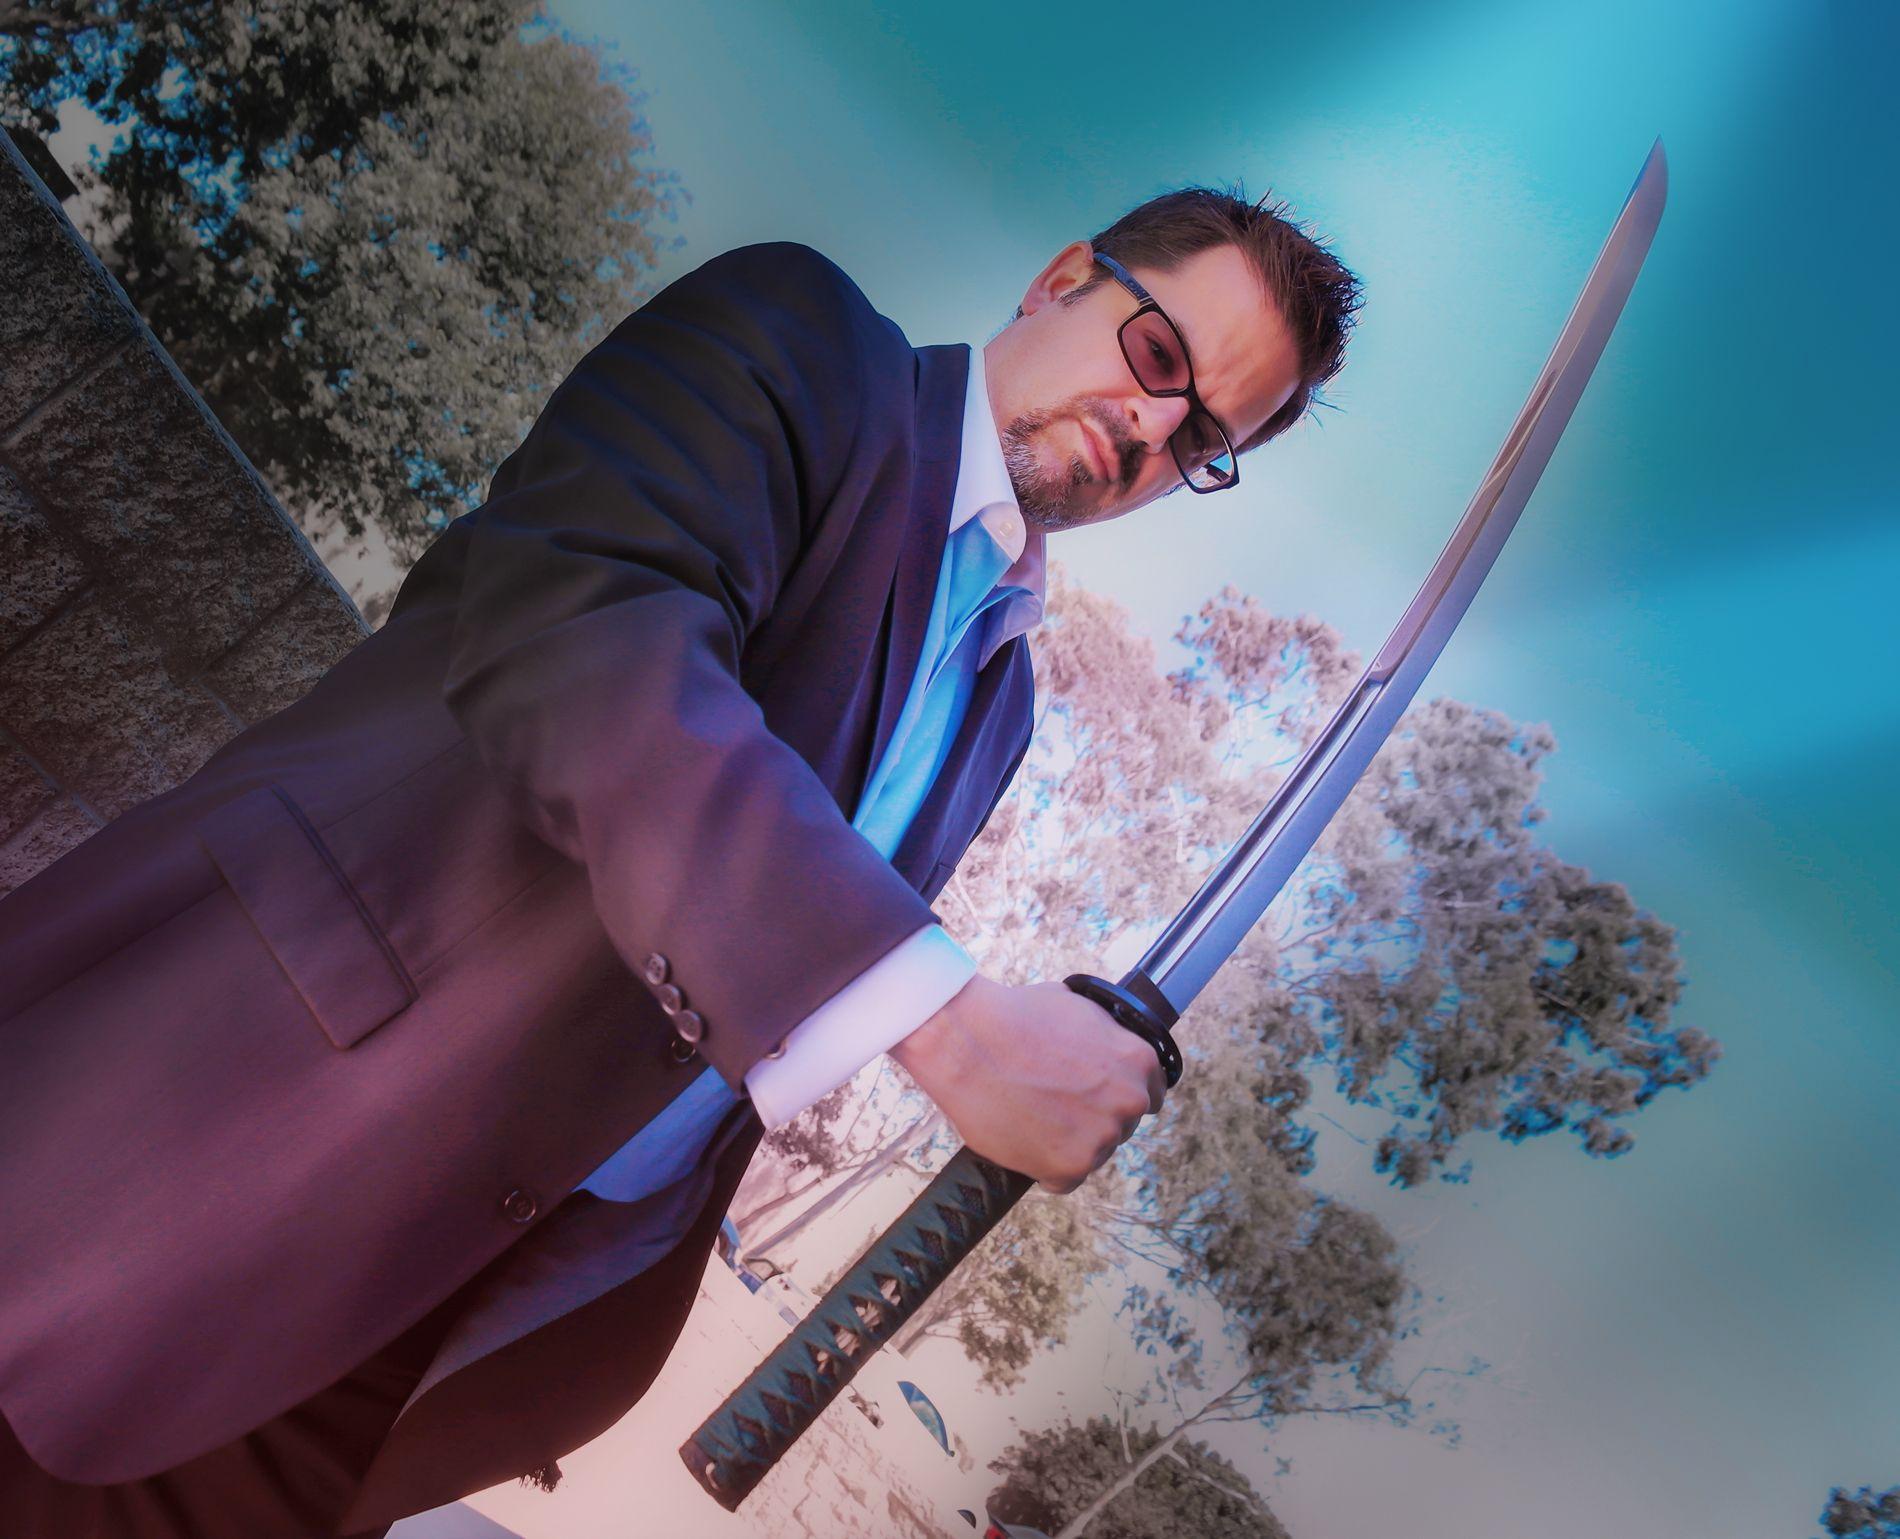 Cold Steel Dragonfly Katana Coldsteel Sword Ninja Swords Samurai